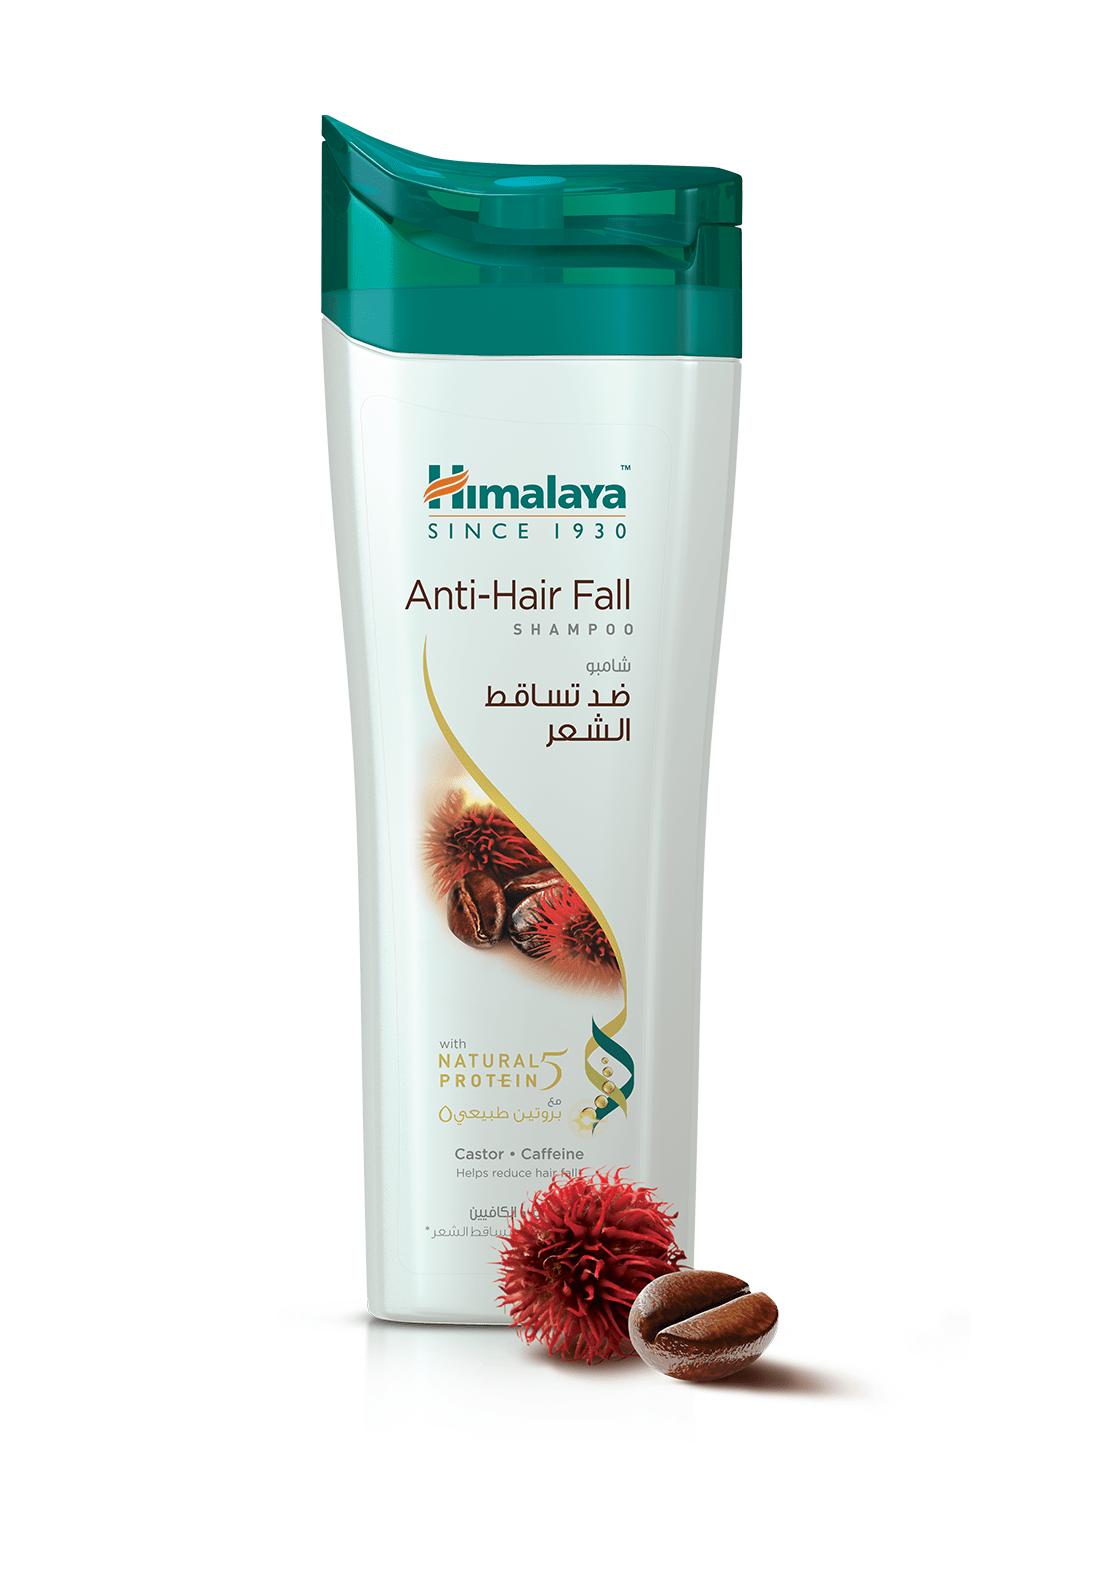 Shampoo 400ml - Anti-Hair Fall هيمالايا شامبو ضد تساقط الشعر